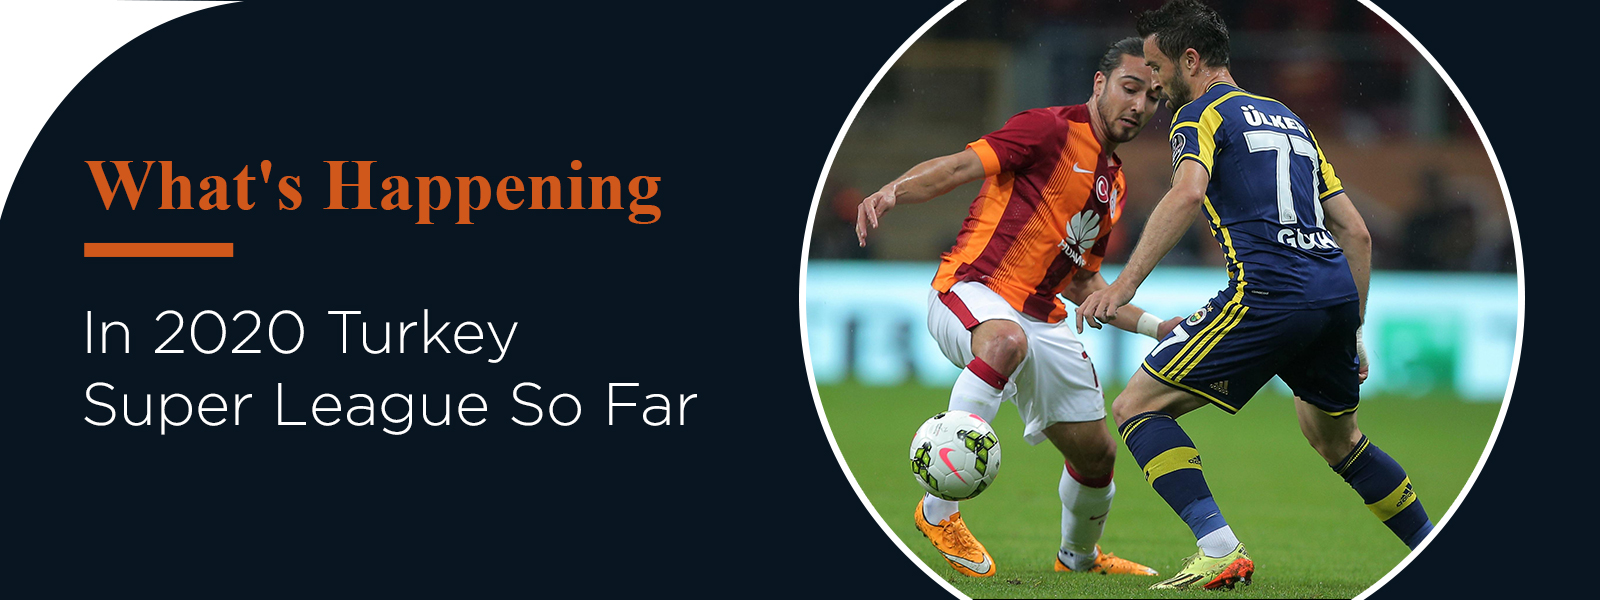 What's Happening In 2020 Turkey Super League So Far